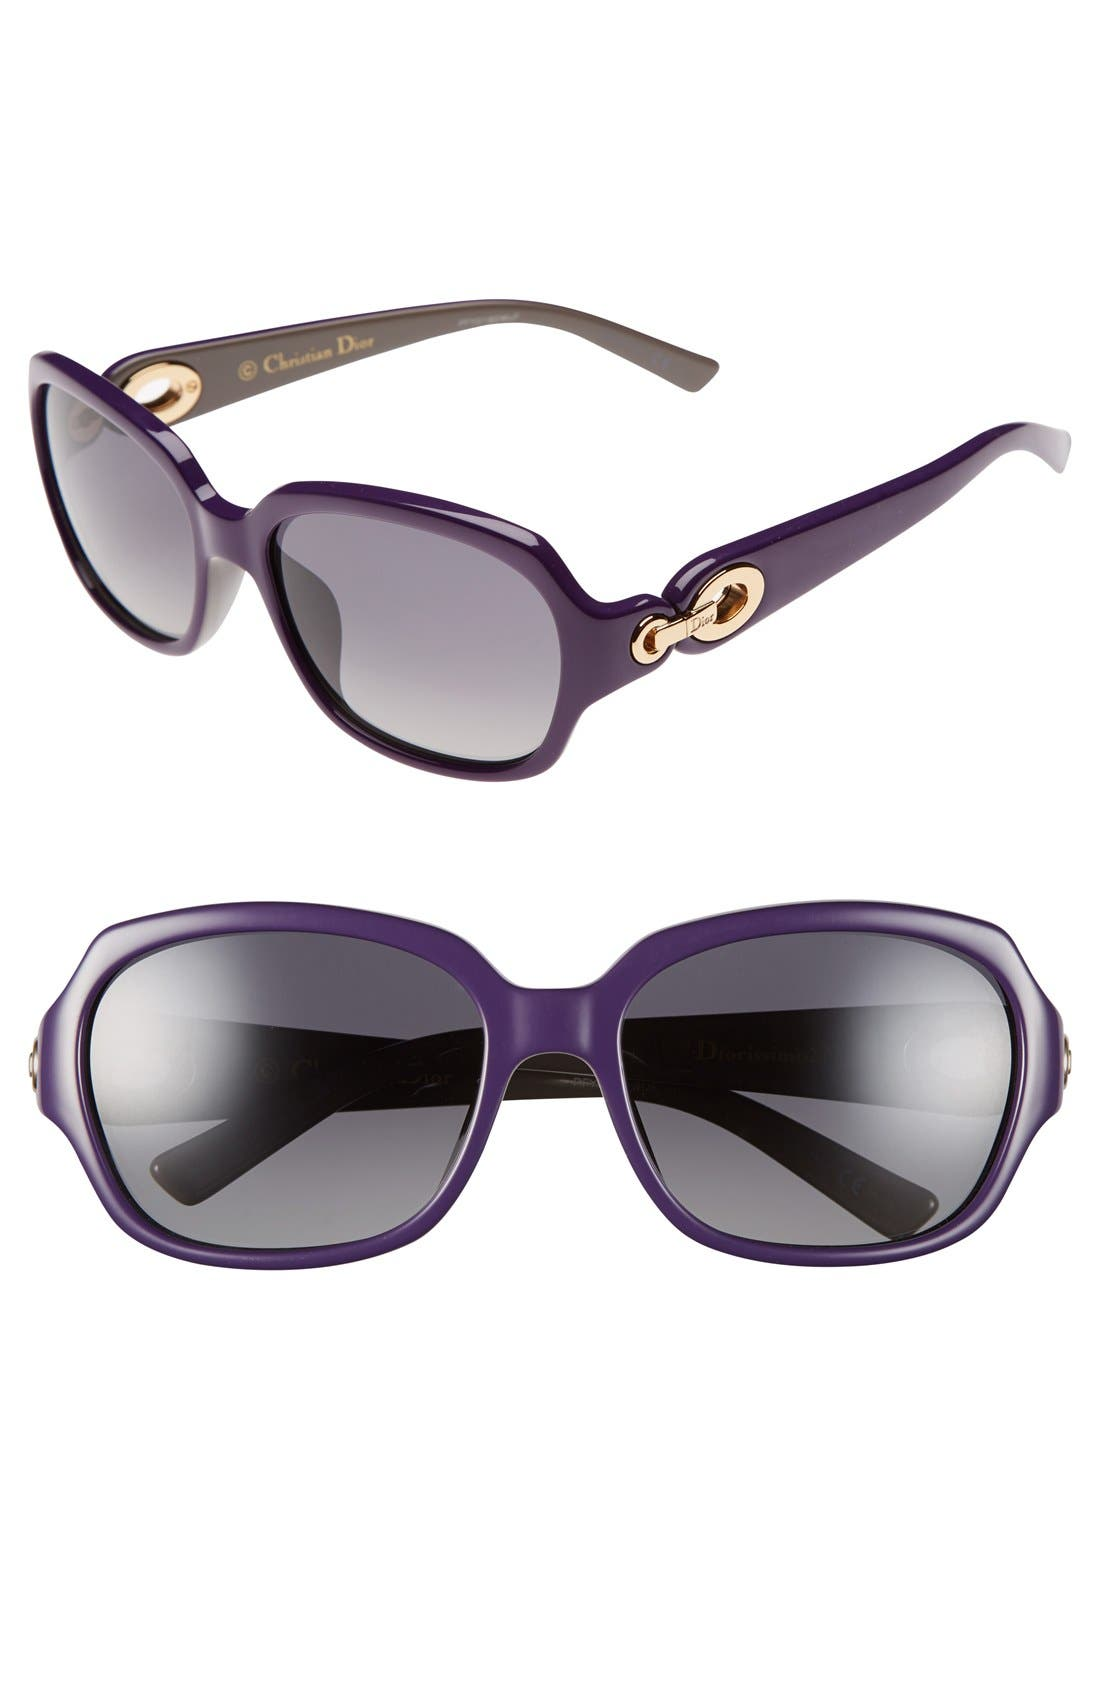 Alternate Image 1 Selected - Christian Dior 56mm Polarized Sunglasses